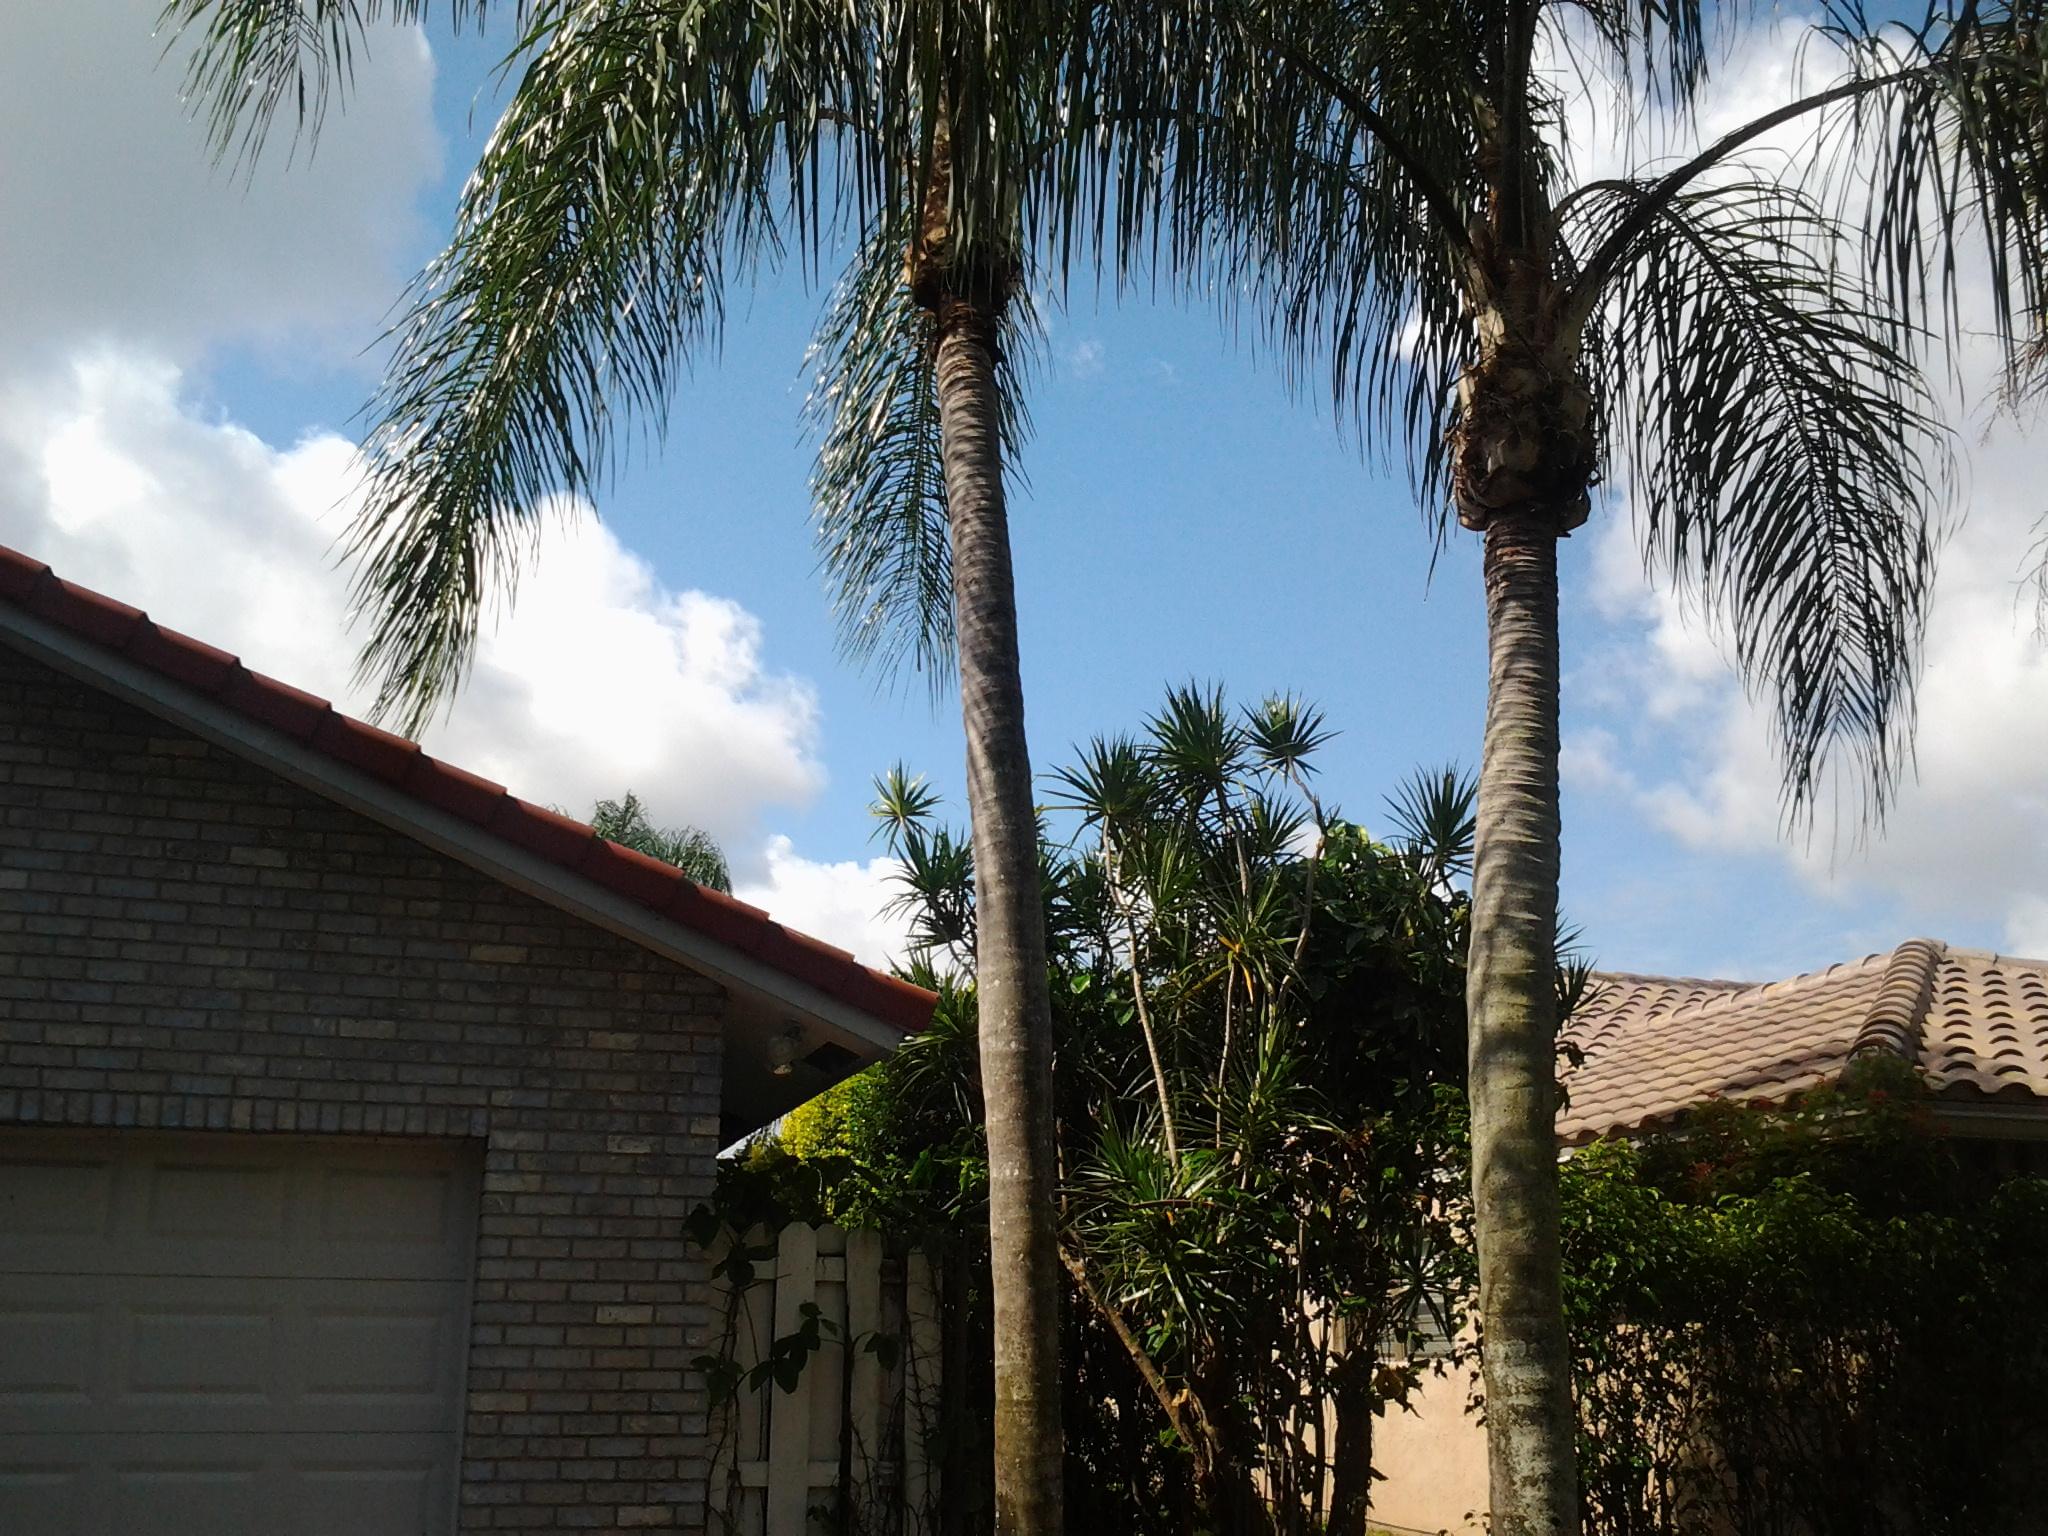 GrassCat Tree & Lawn Service